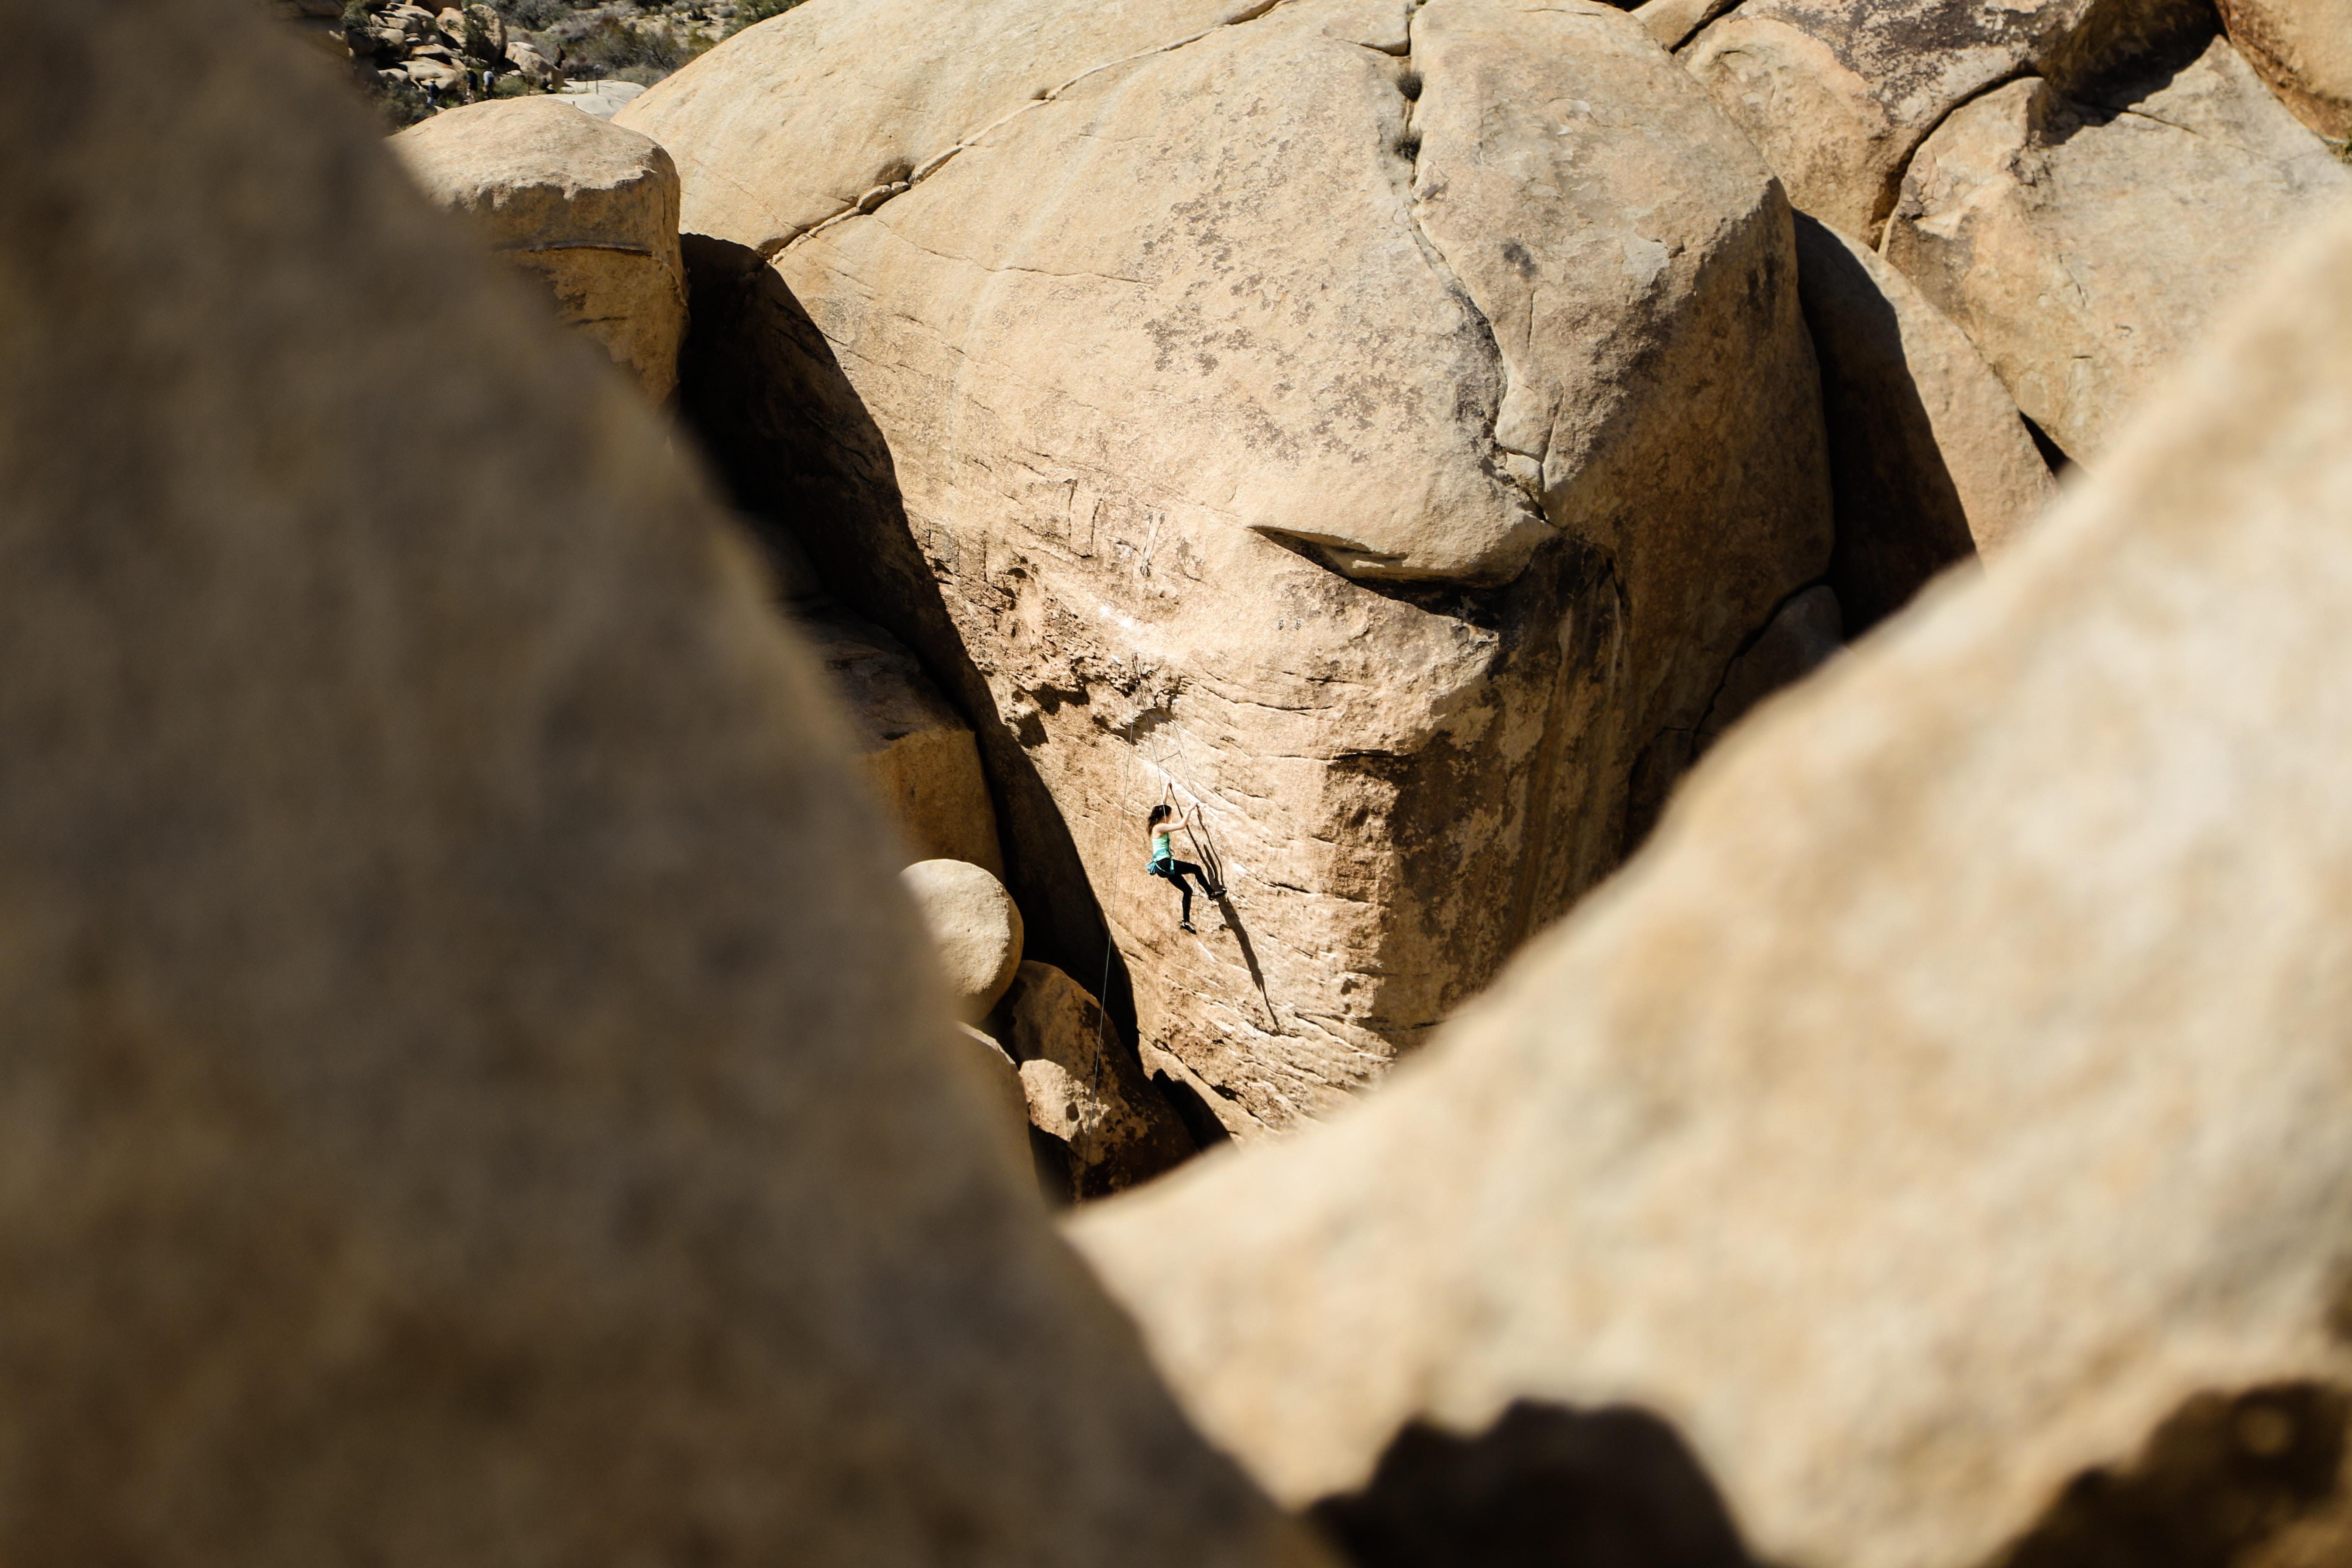 woman climbing on brown rock at daytime